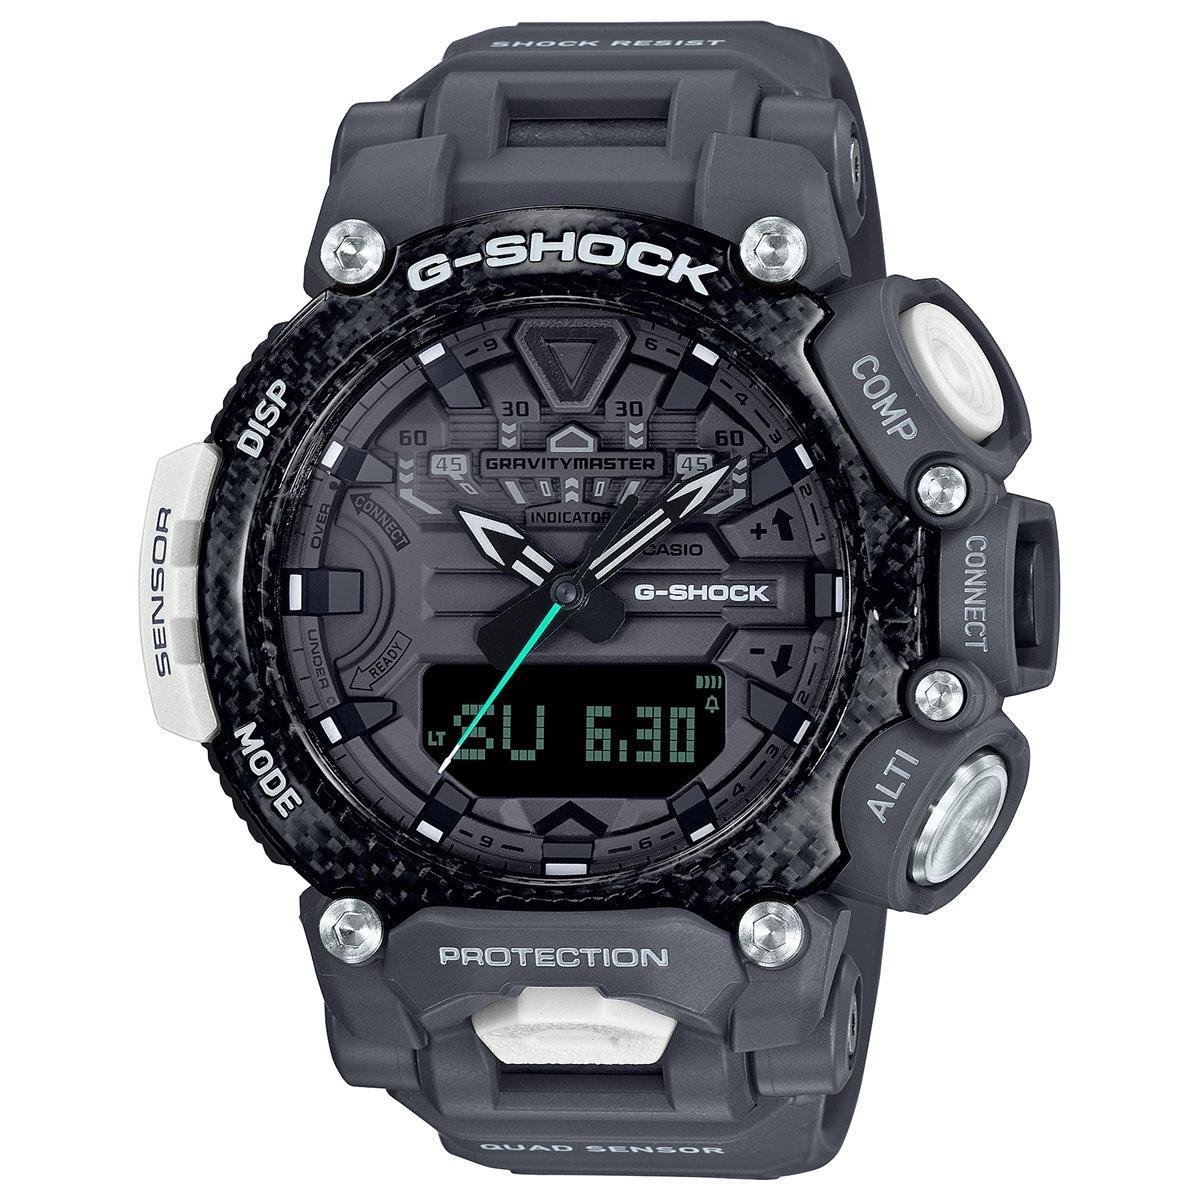 G-SHOCK カシオ Gショック グラビティマスター GRAVITYMASTER CASIO ROYAL AIR FORCE タイアップ 限定モデル 腕時計 メンズ MASTER OF G GR-B200RAF-8AJR